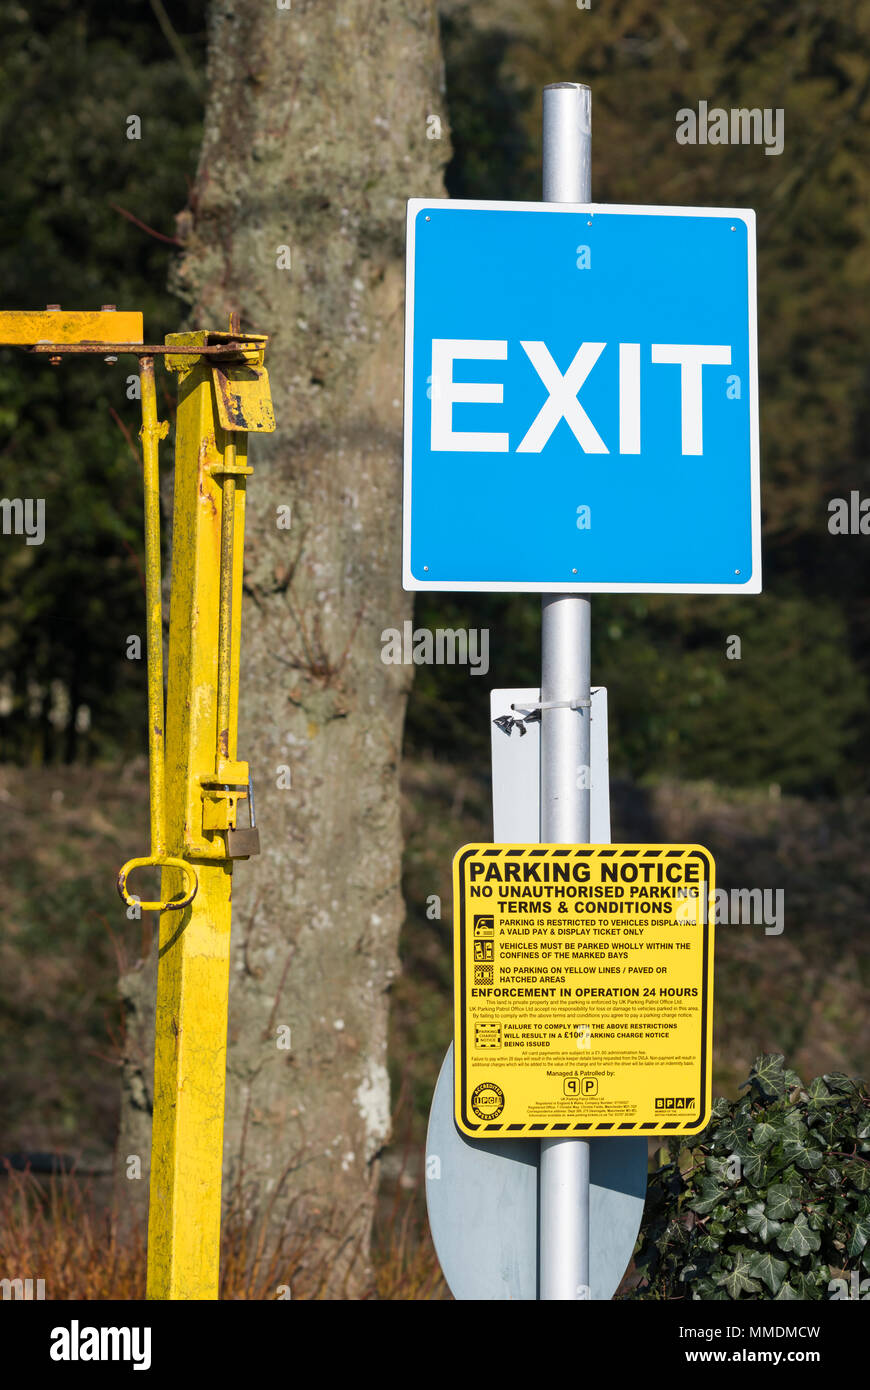 Car park exit sign. - Stock Image